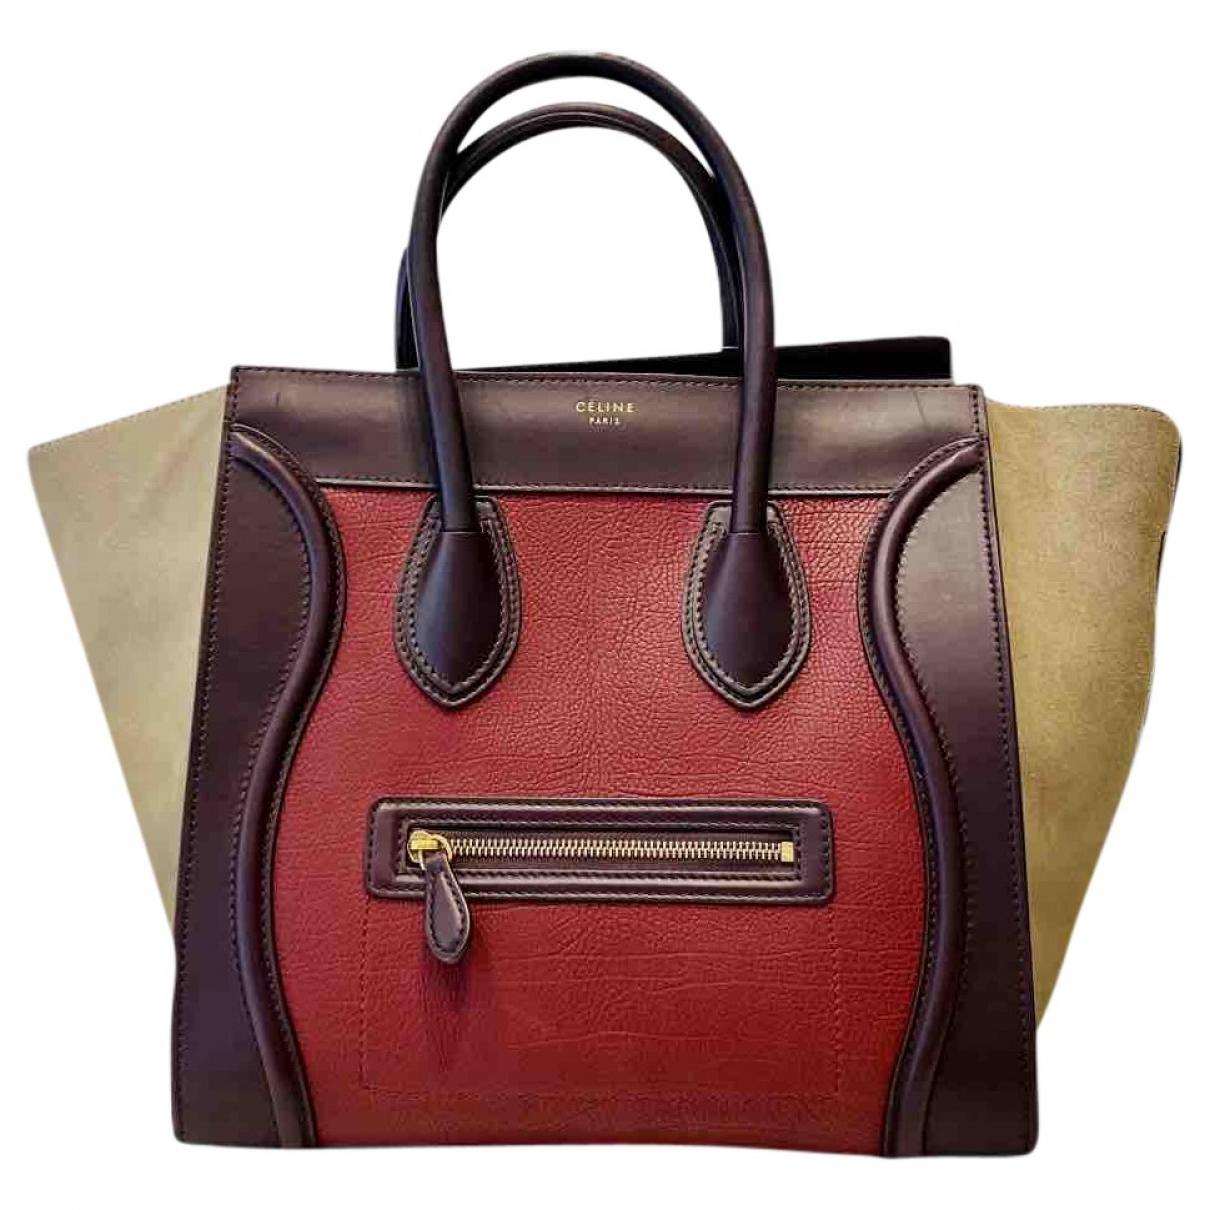 Celine Luggage Burgundy Leather handbag for Women \N